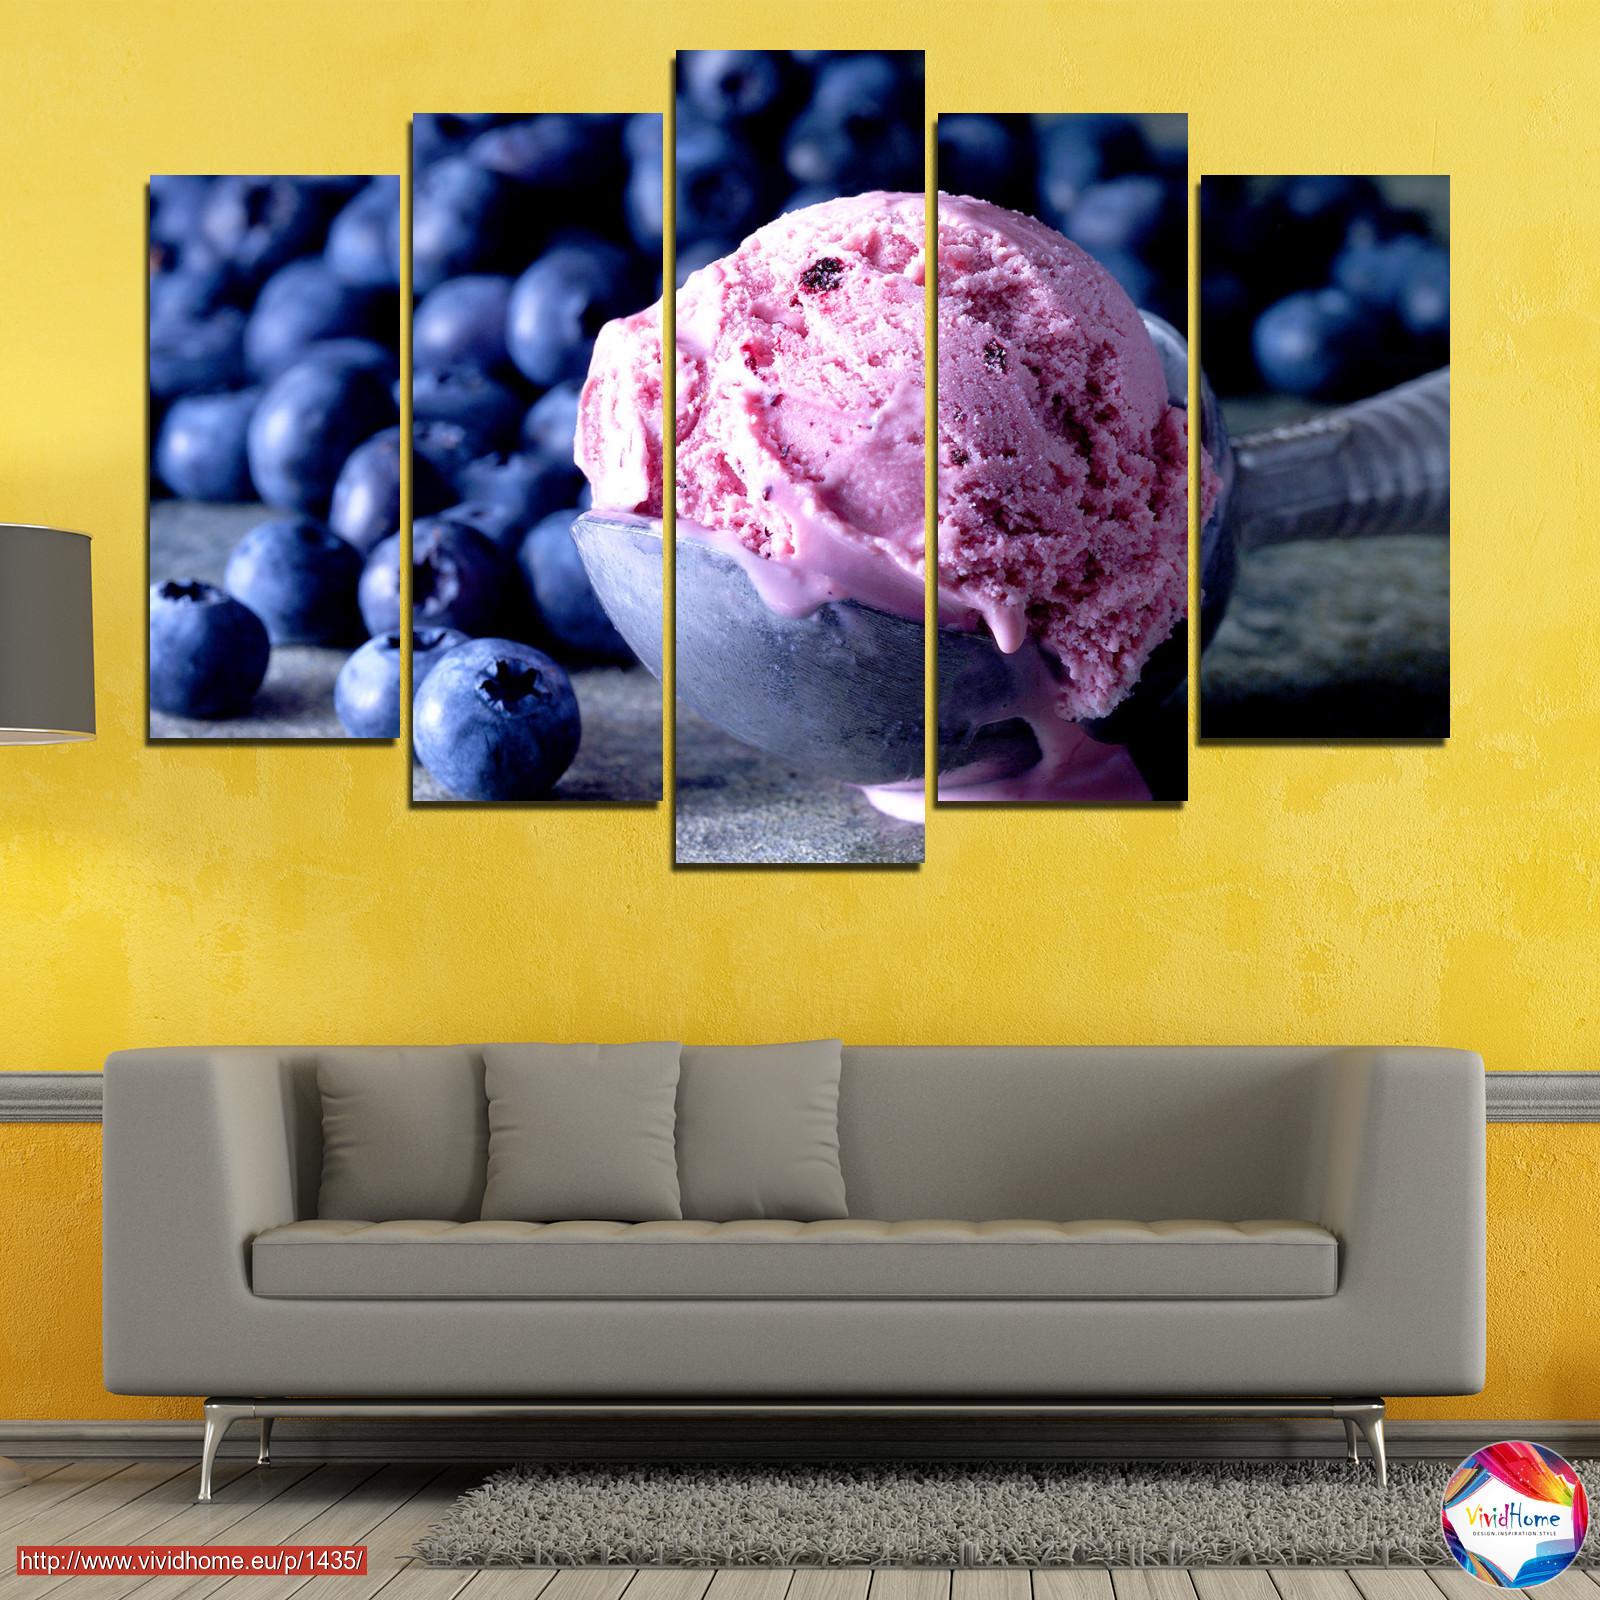 Colorful, Fresh, Natural, Food, Dessert, Fruit, Tasty, Sweet №0735